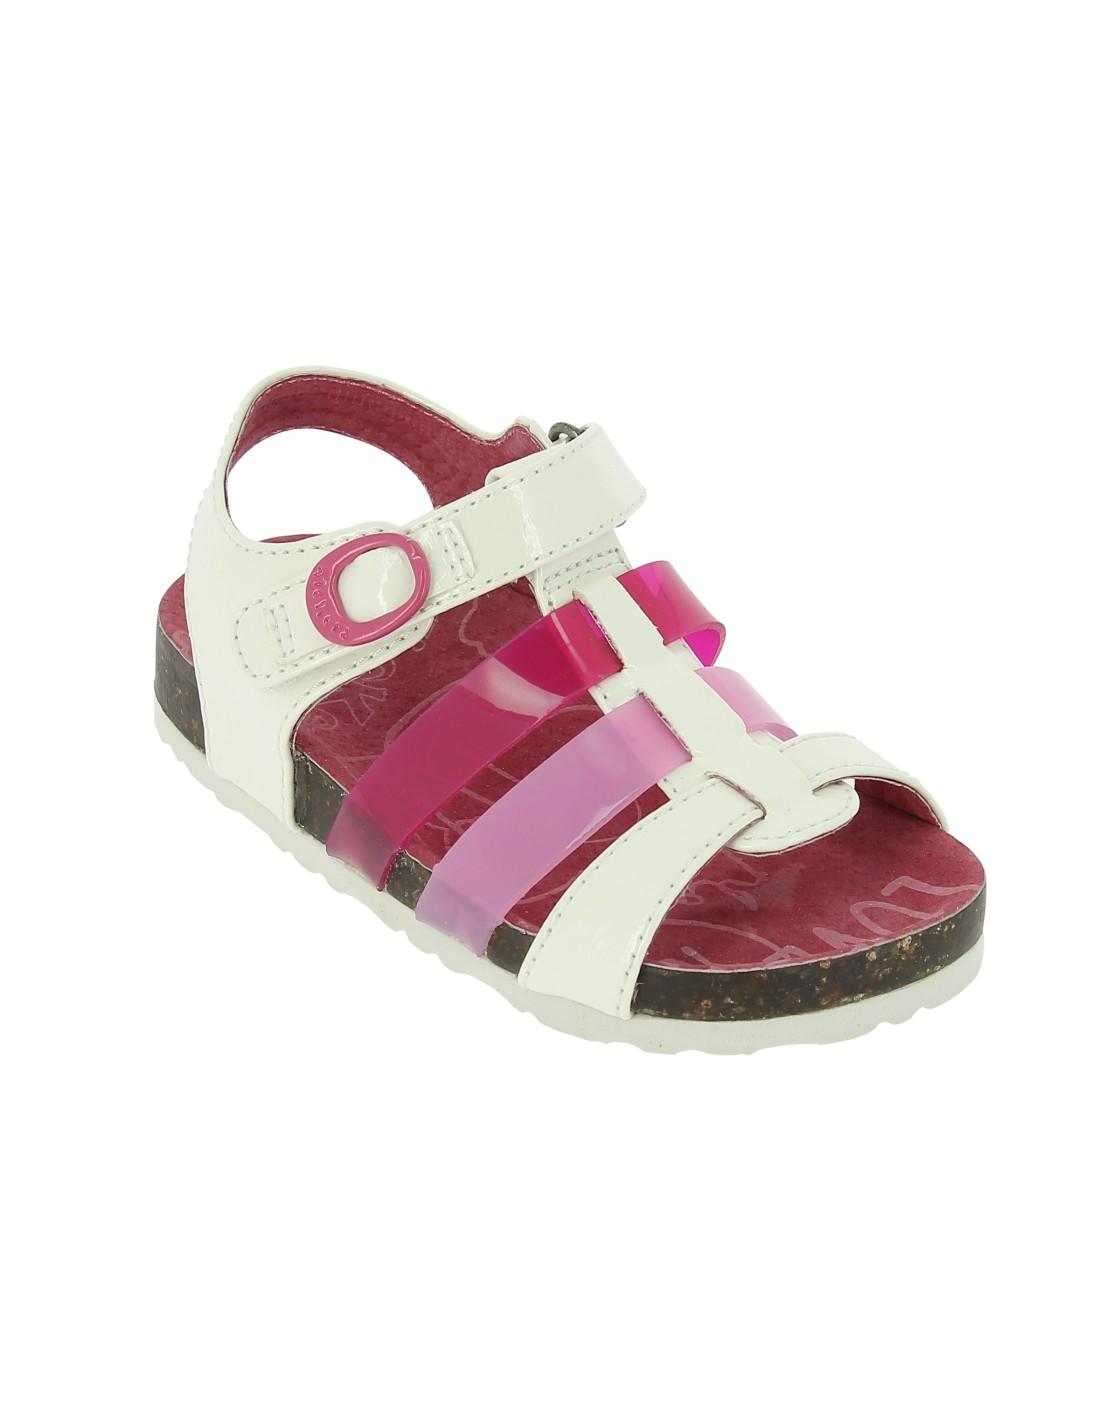 bf12ceb5a sandalias de piel niñas